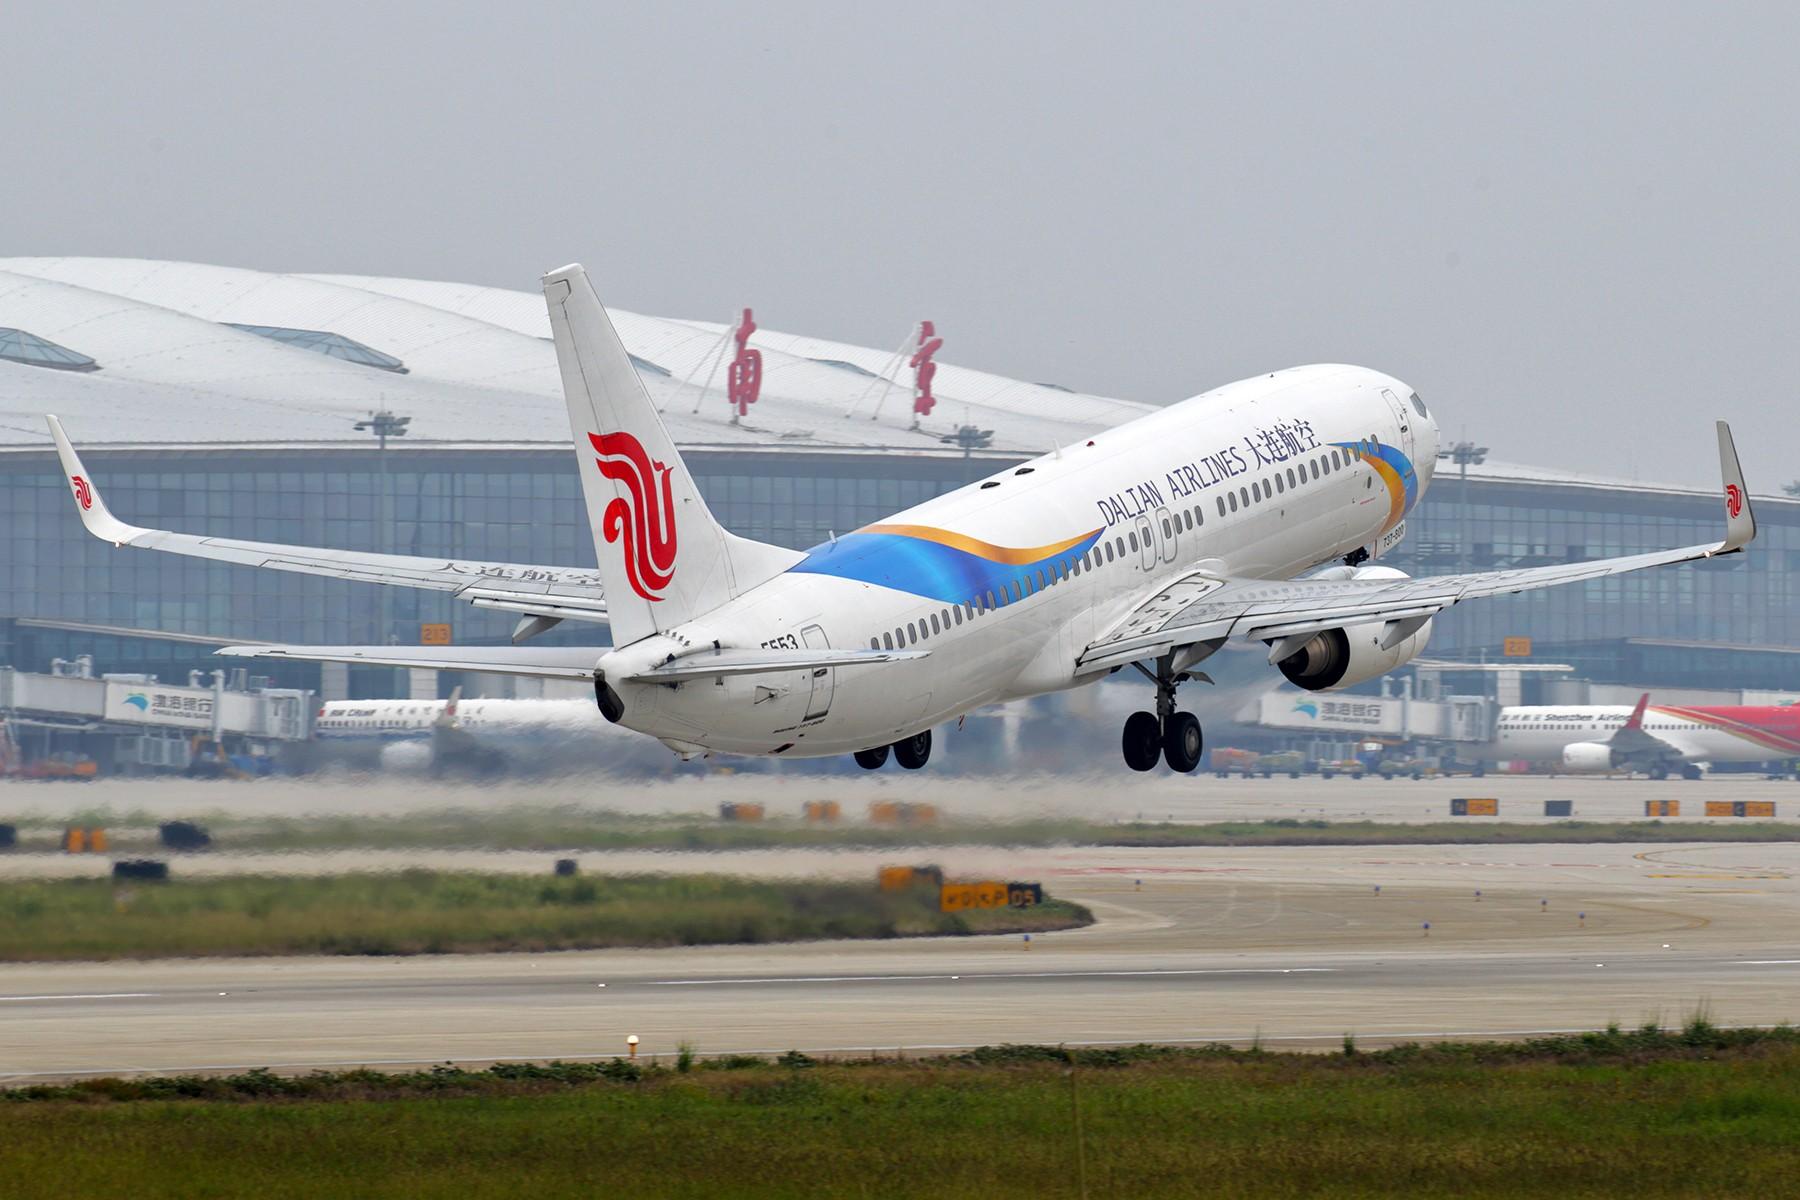 Re:[原创]【BLDDQ】******NKG07/25单跑道运行中****** BOEING 737-800 B-5553 中国南京禄口国际机场